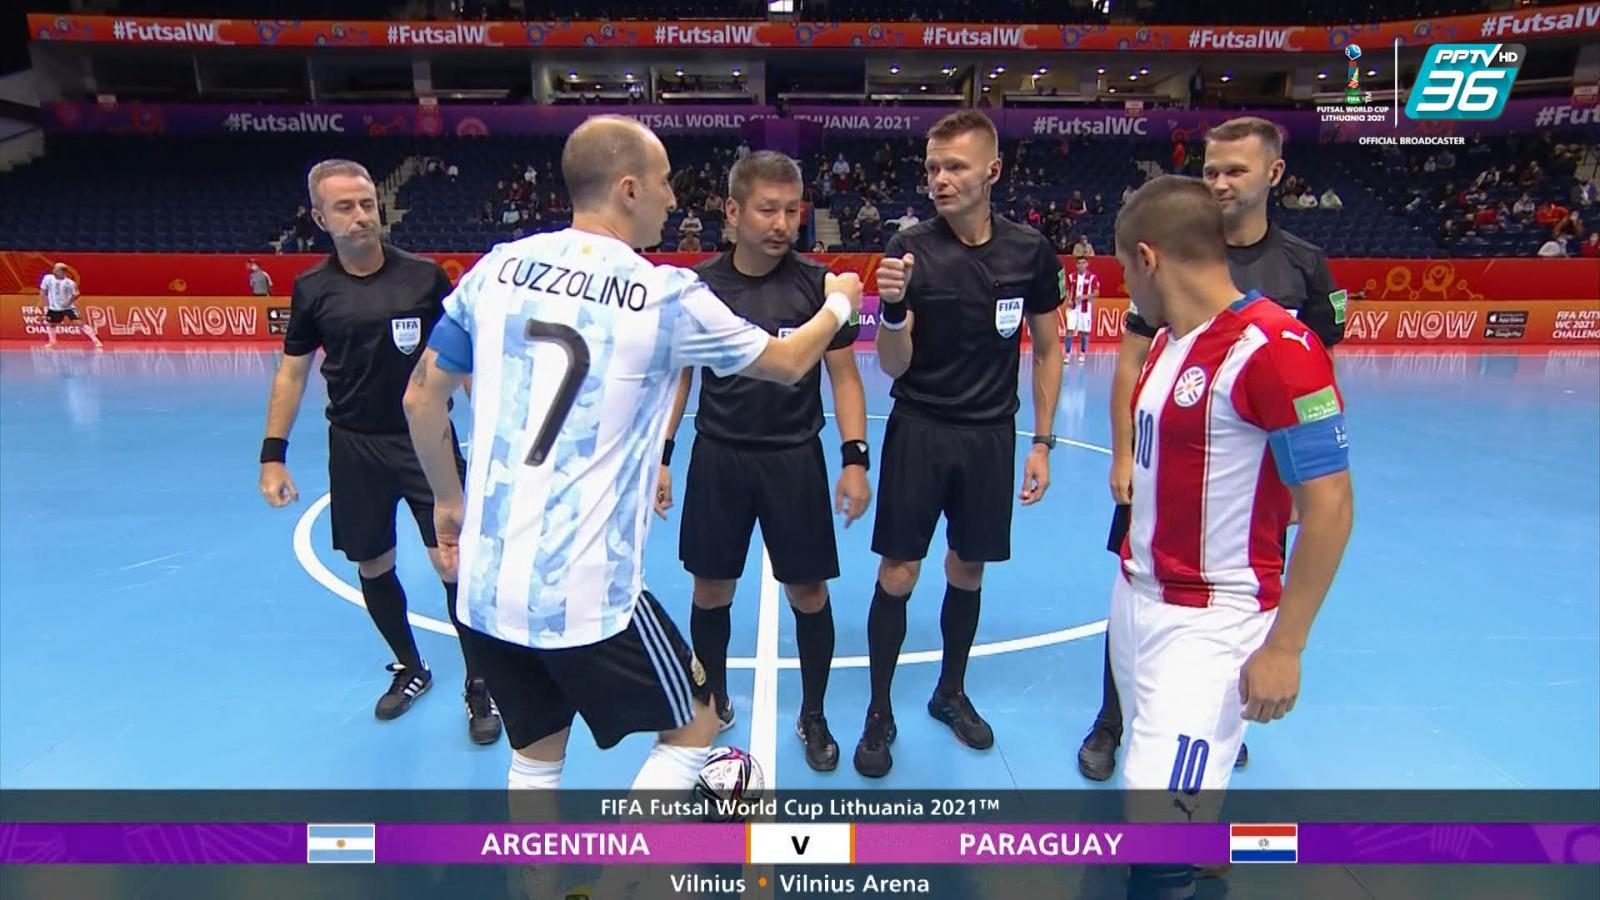 Full Match   ฟีฟ่า ฟุตซอล เวิลด์ คัพ 2021   อาร์เจนตินา 6-1 ปารากวัย   23 ก.ย. 64